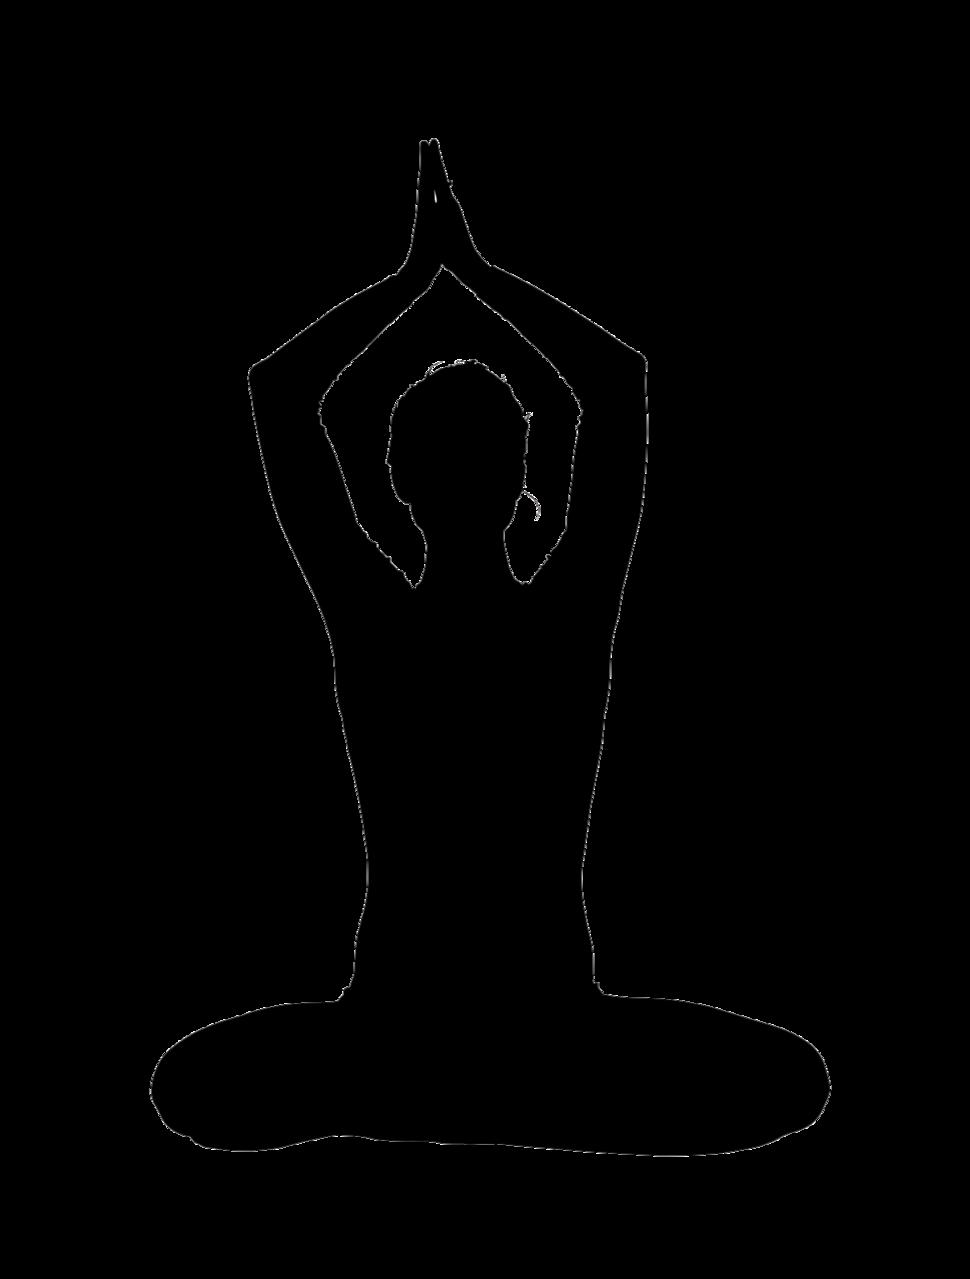 Silhouette yoga